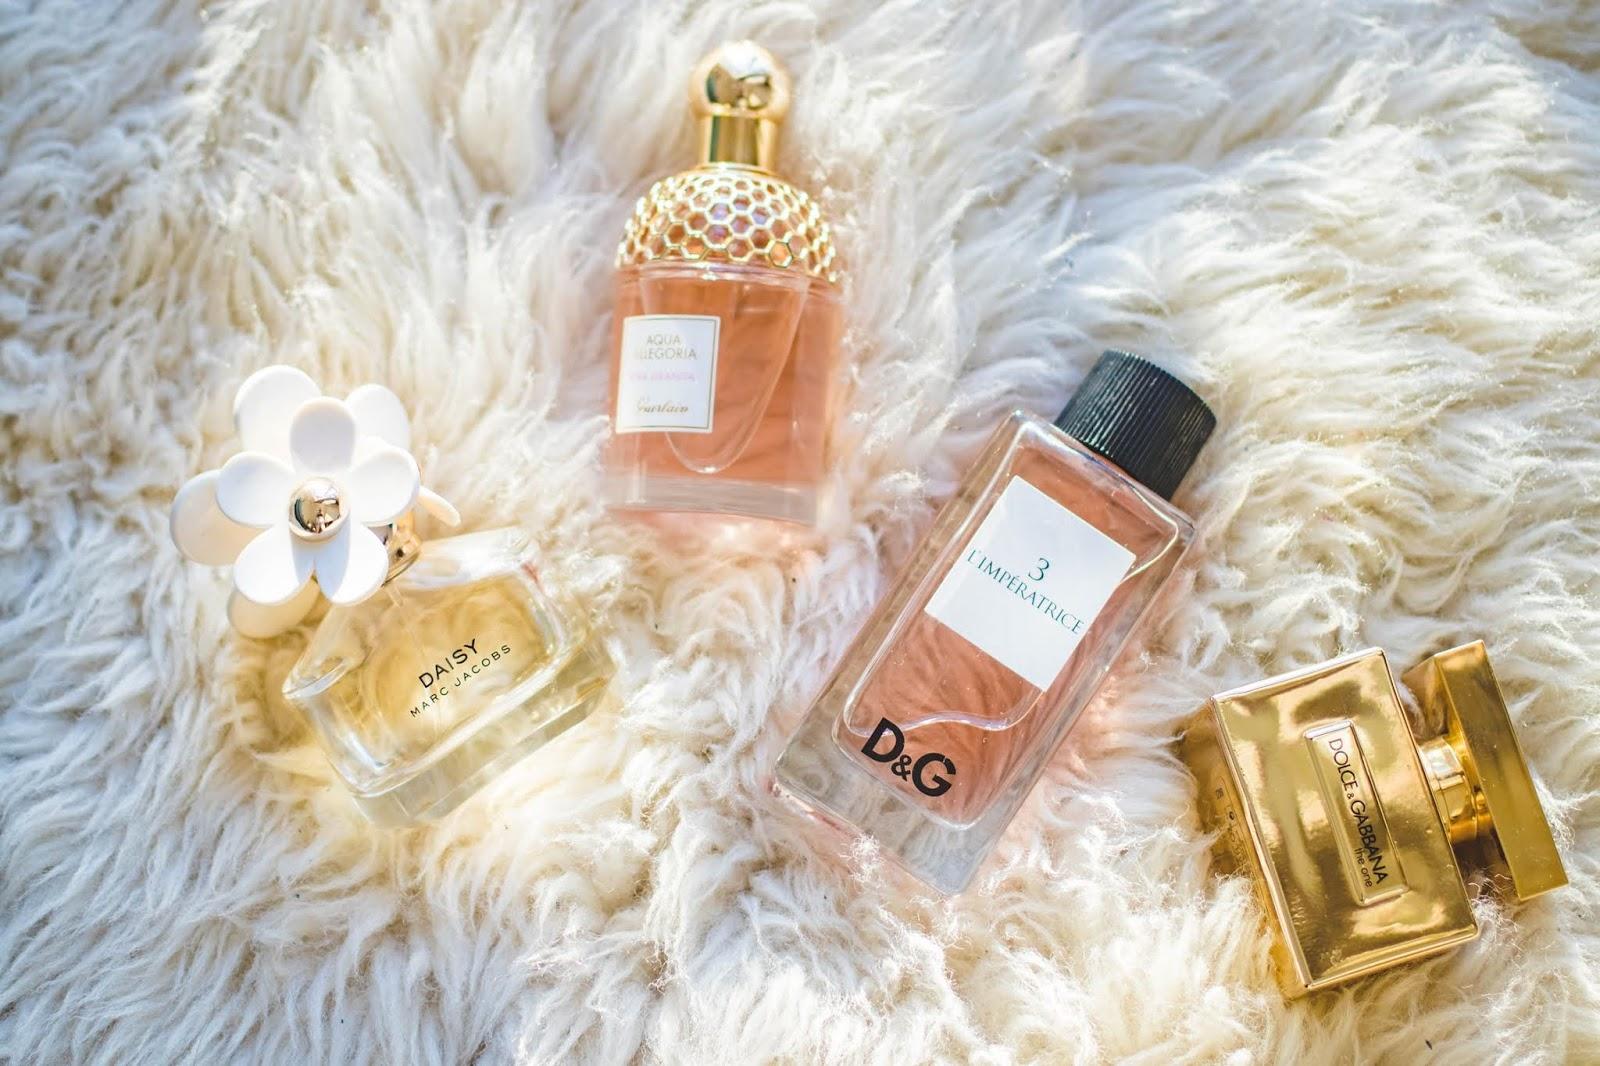 perfume bottles in a flat lay arrangement